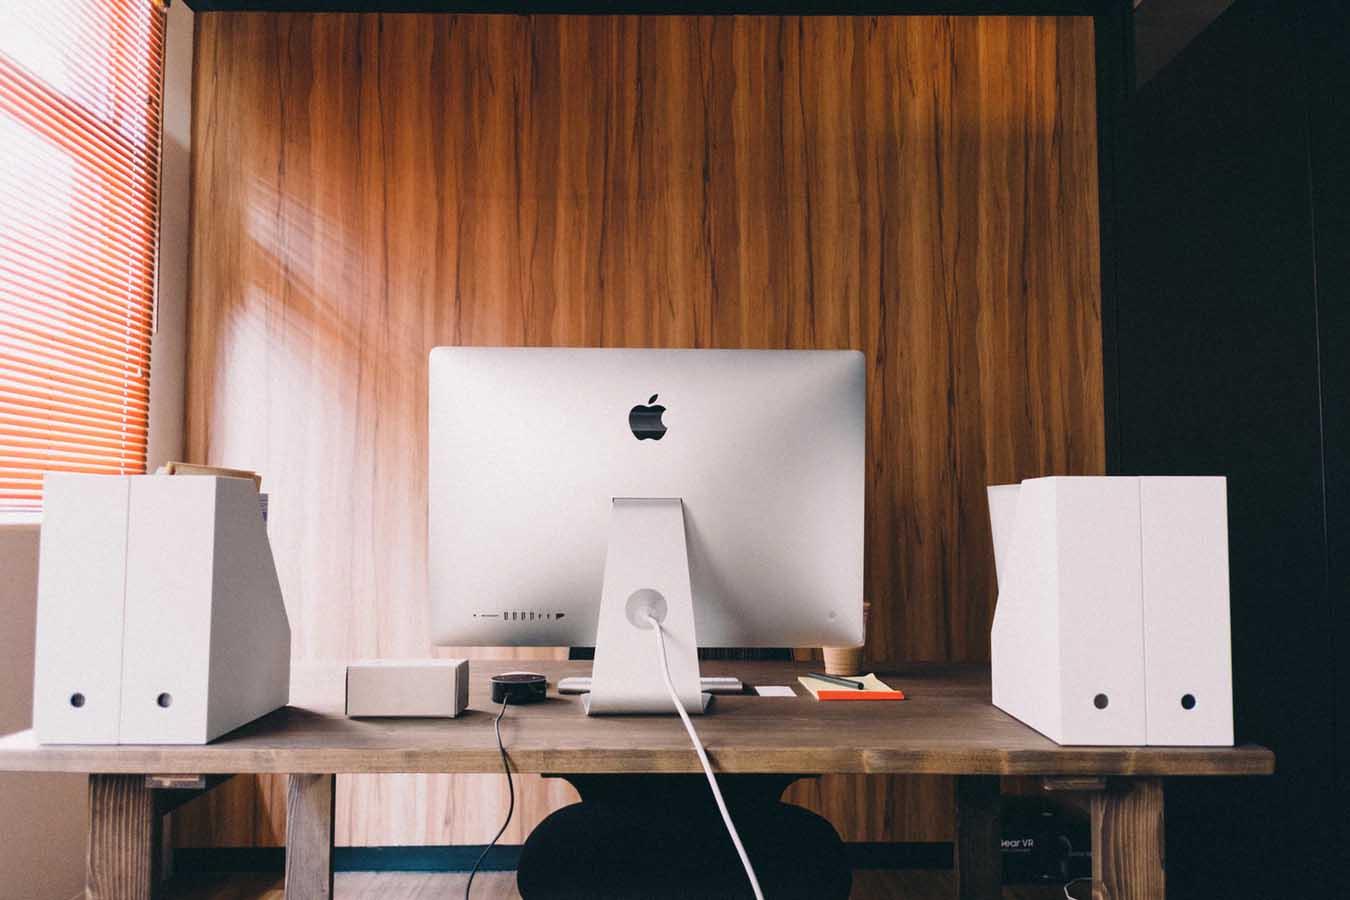 Archisoup-best standing desk for home office.jpg